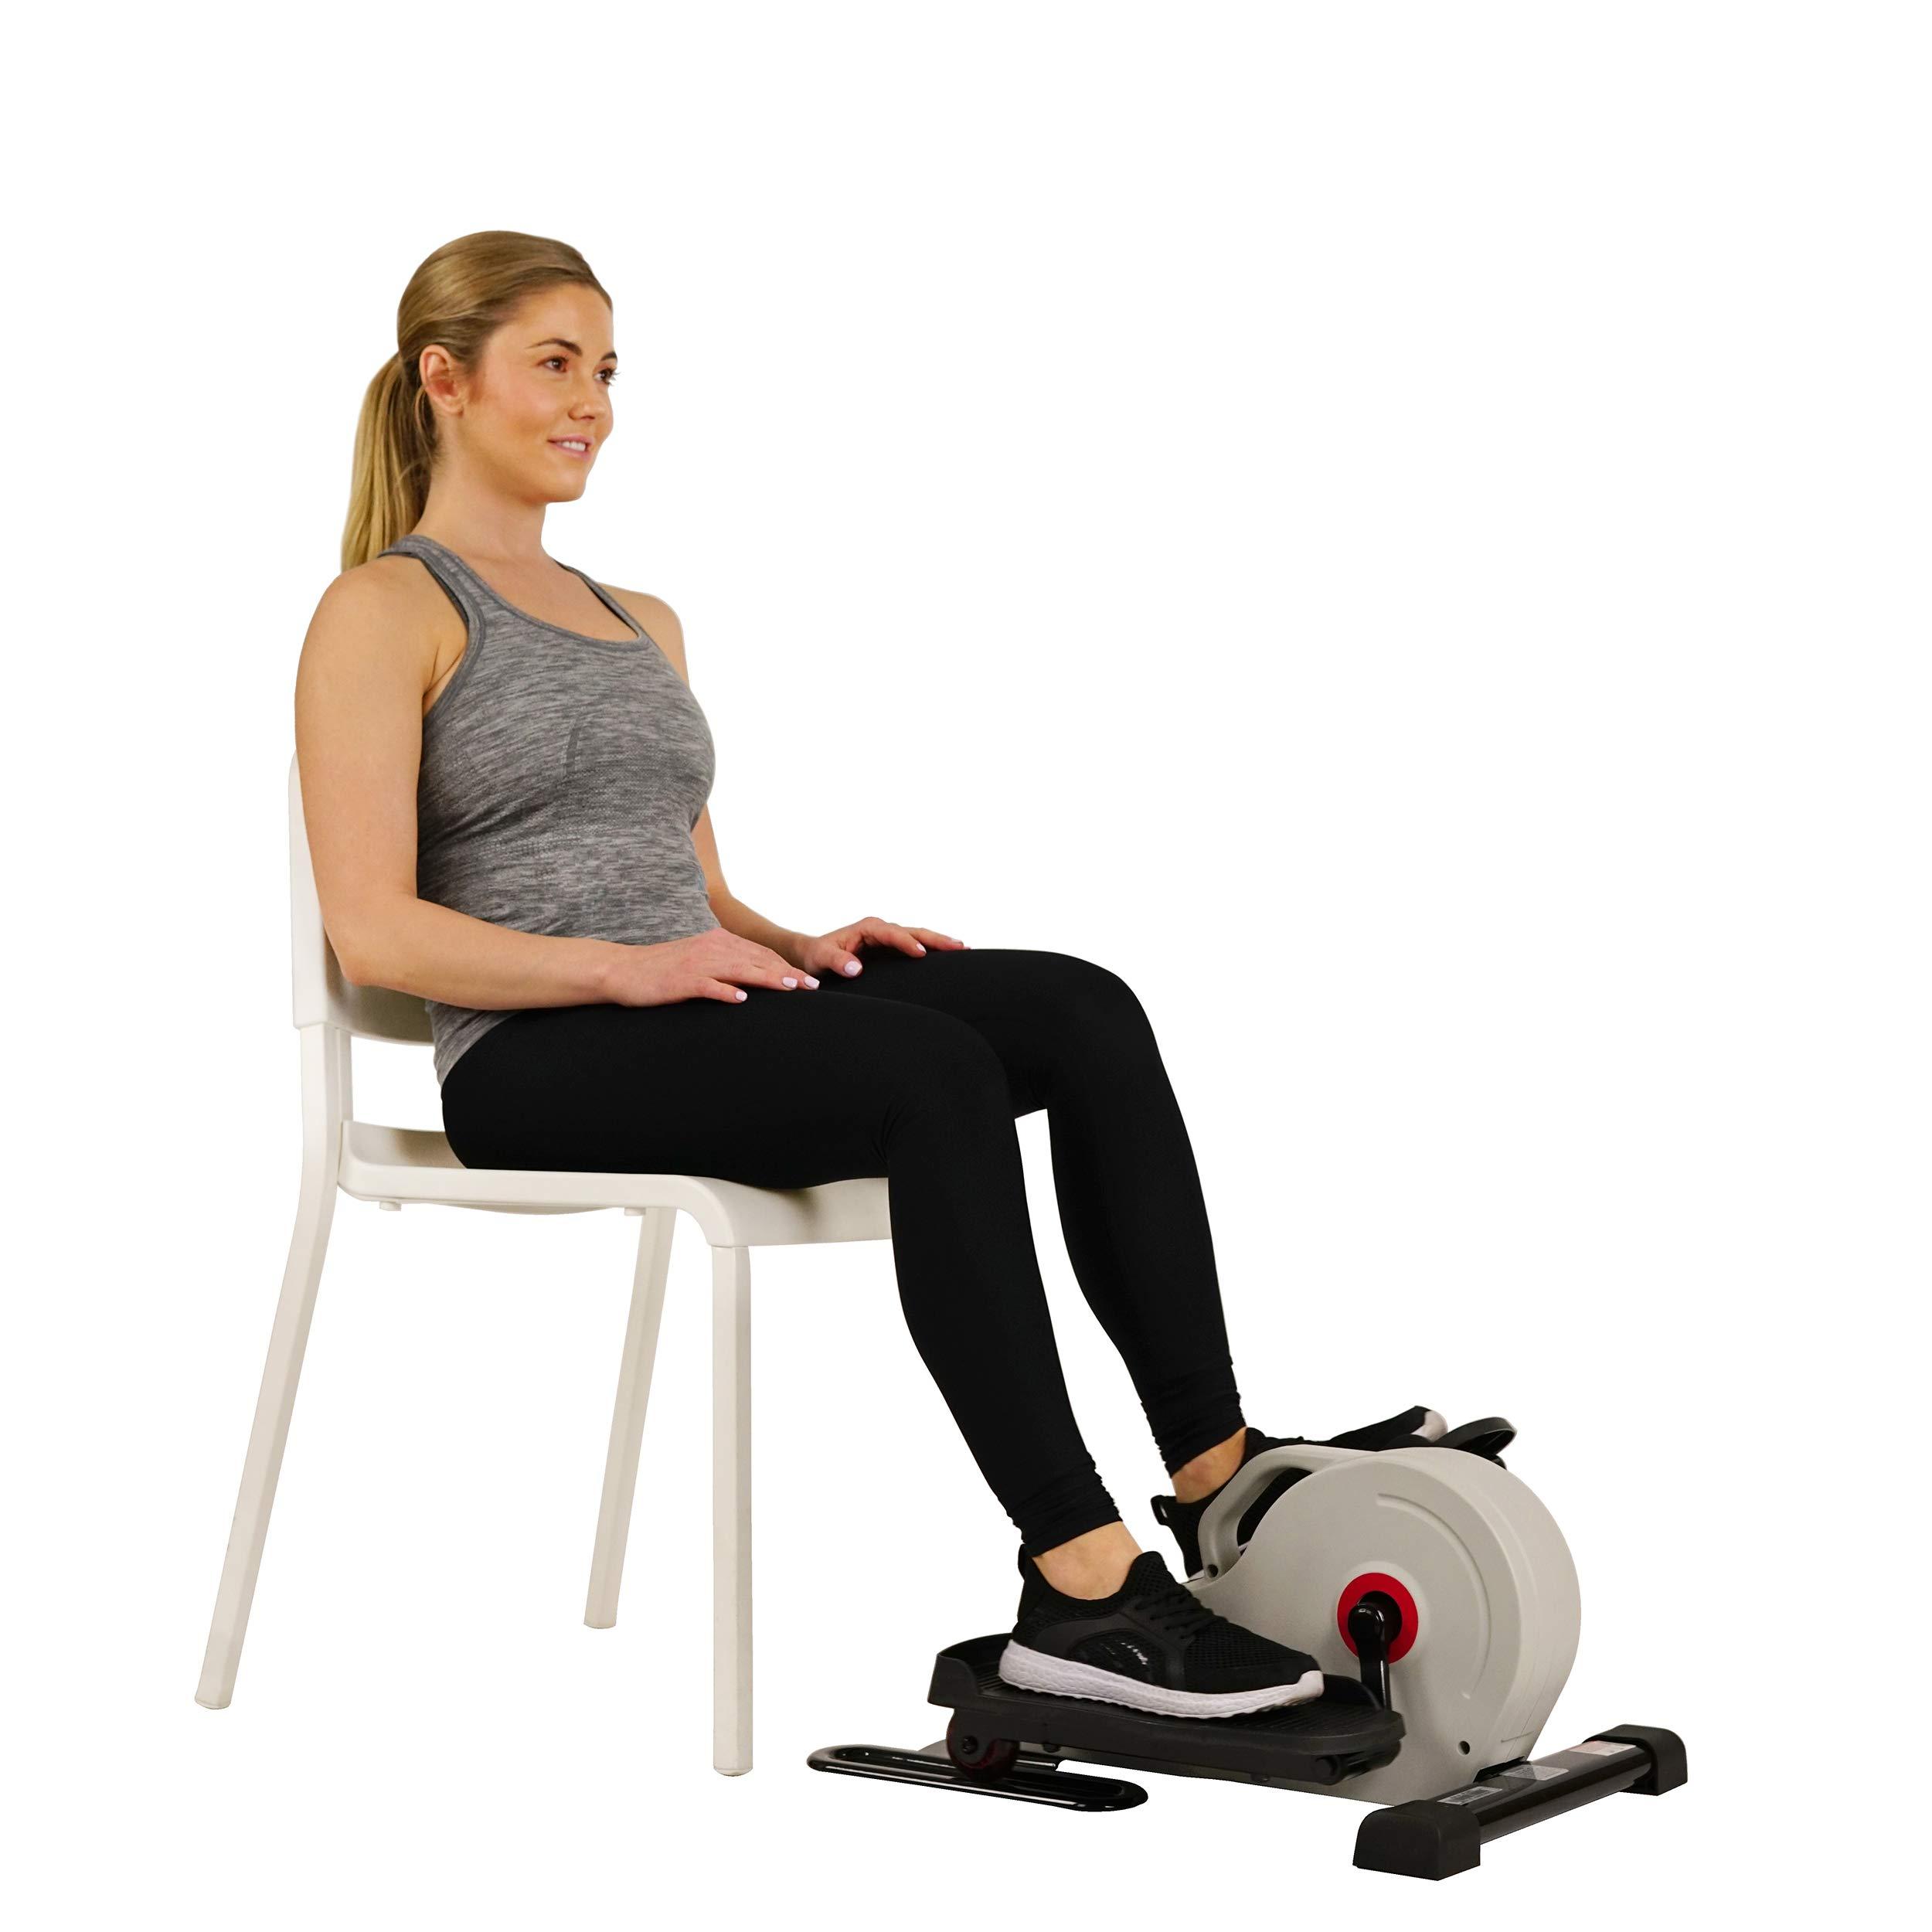 Sunny Health Fitness Assembled Elliptical